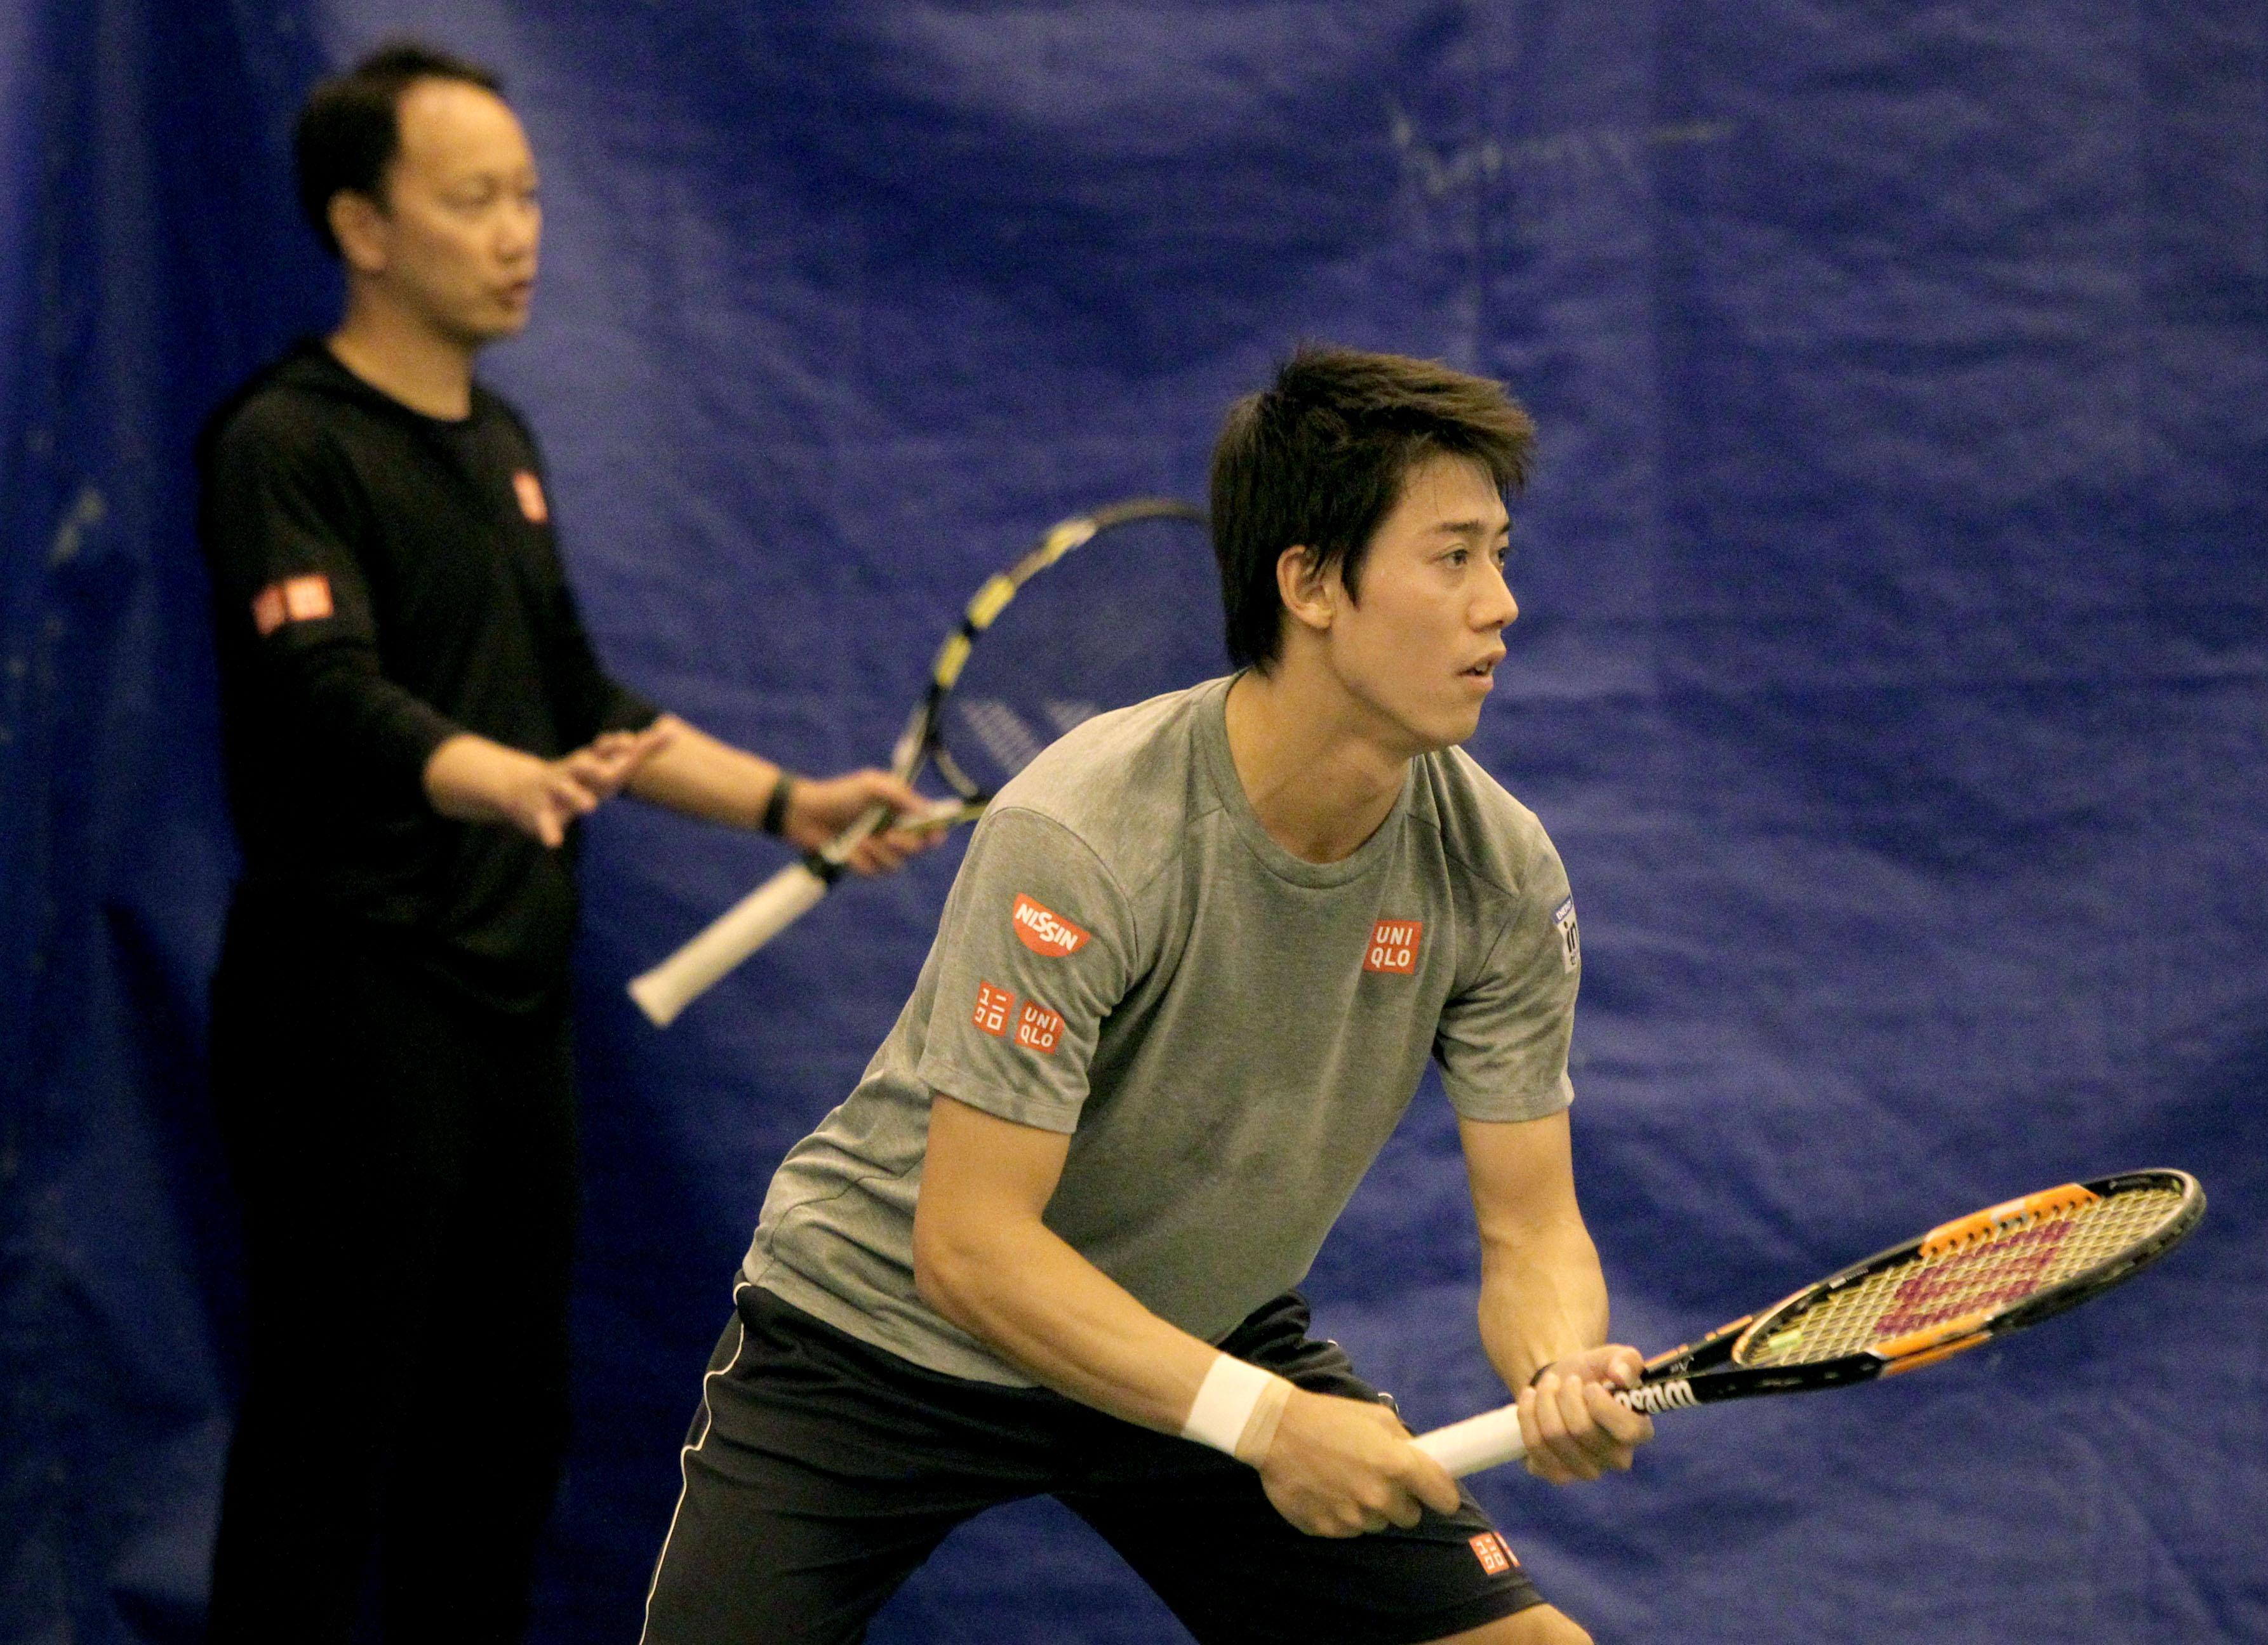 Nishikori survives 3-set match to move into quarterfinals